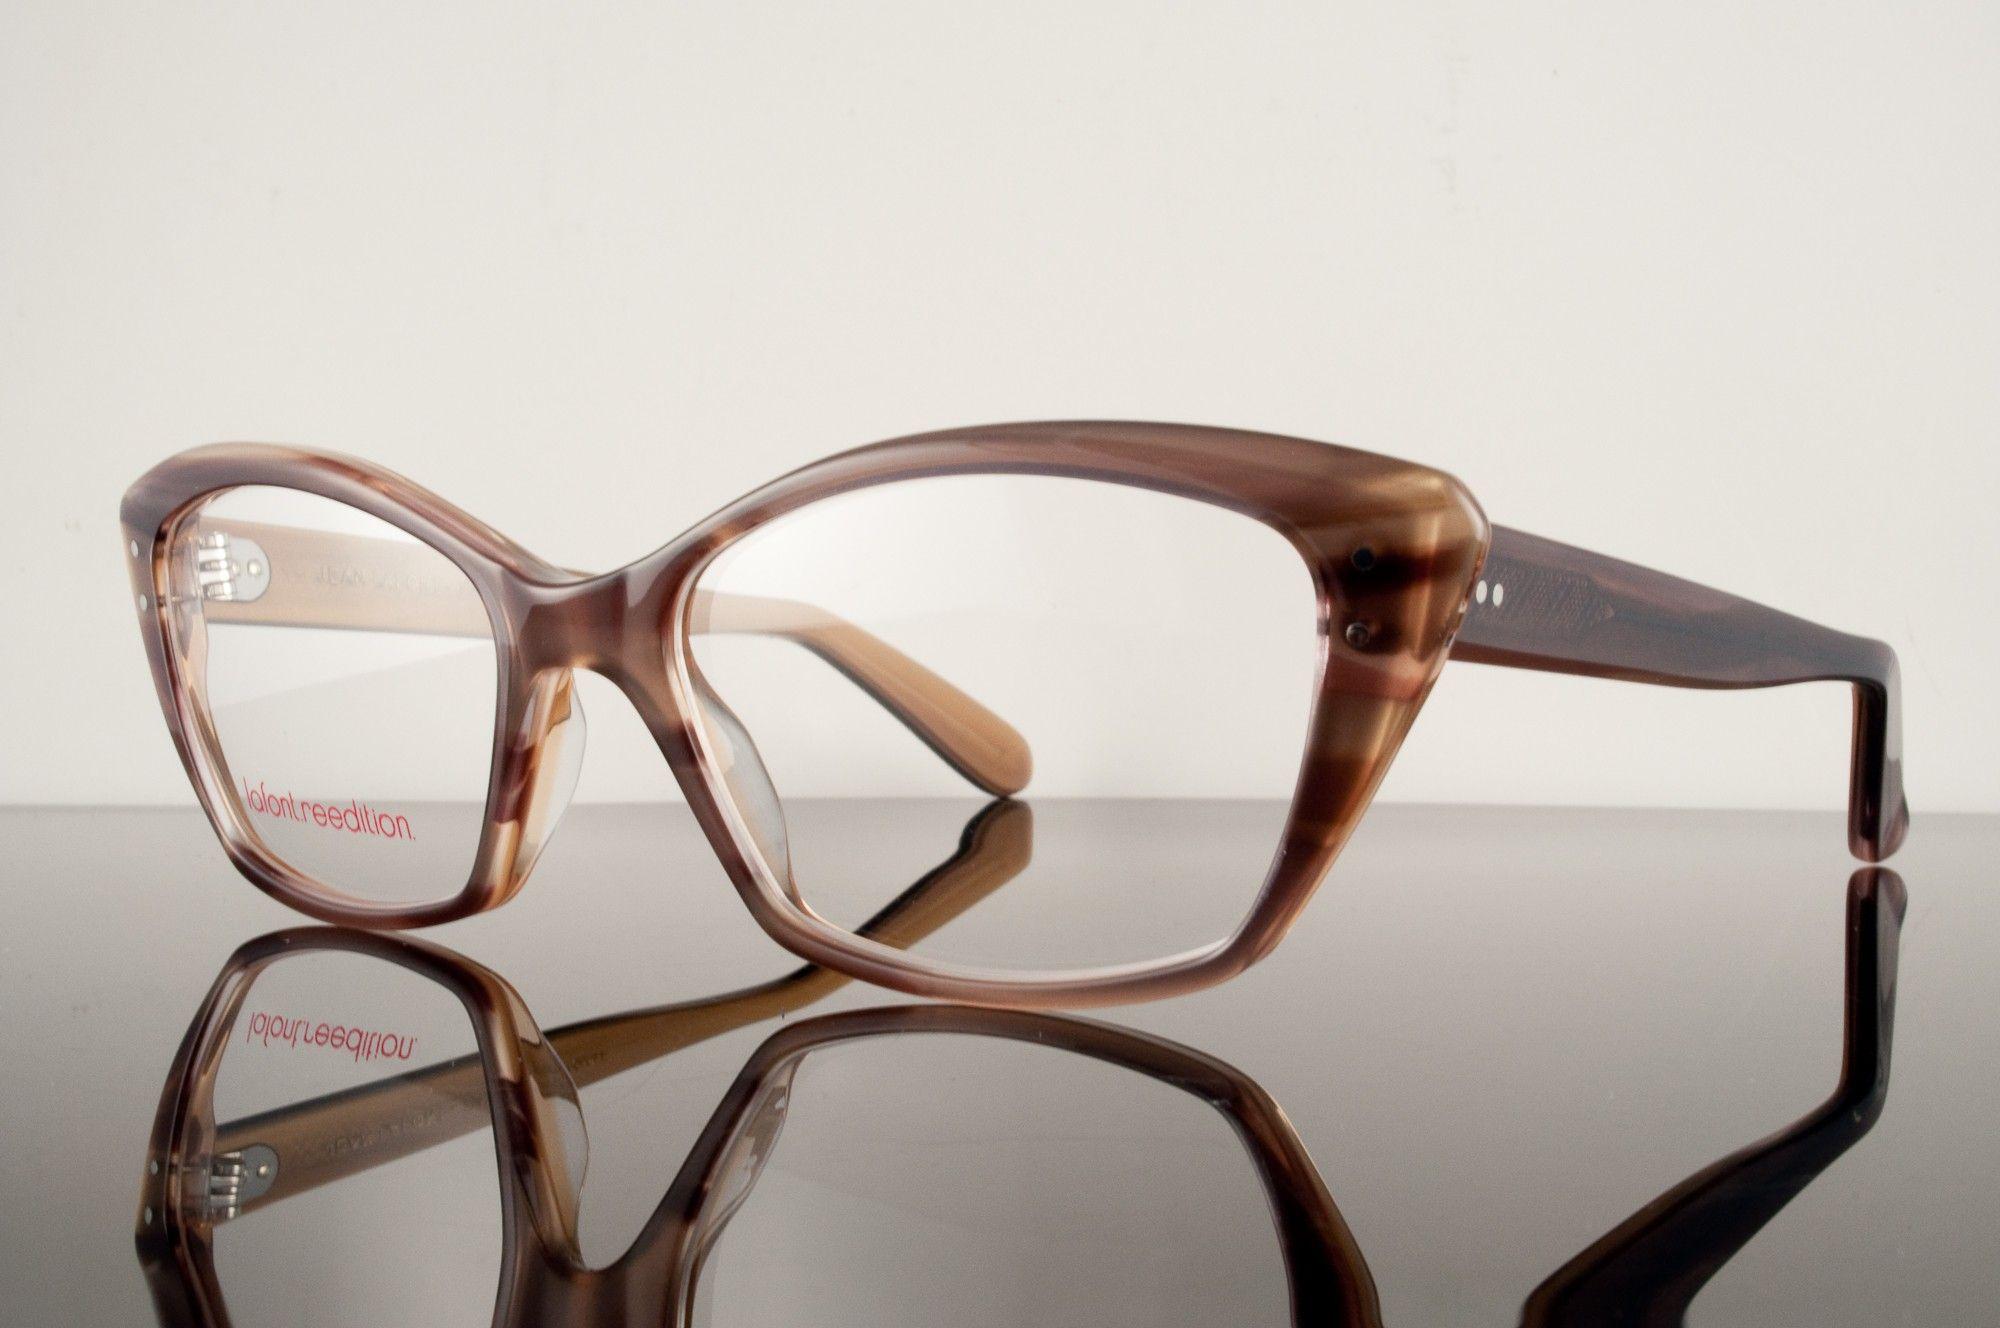 54f6f156df8 Lafont Eyeglasses Honey col. 540